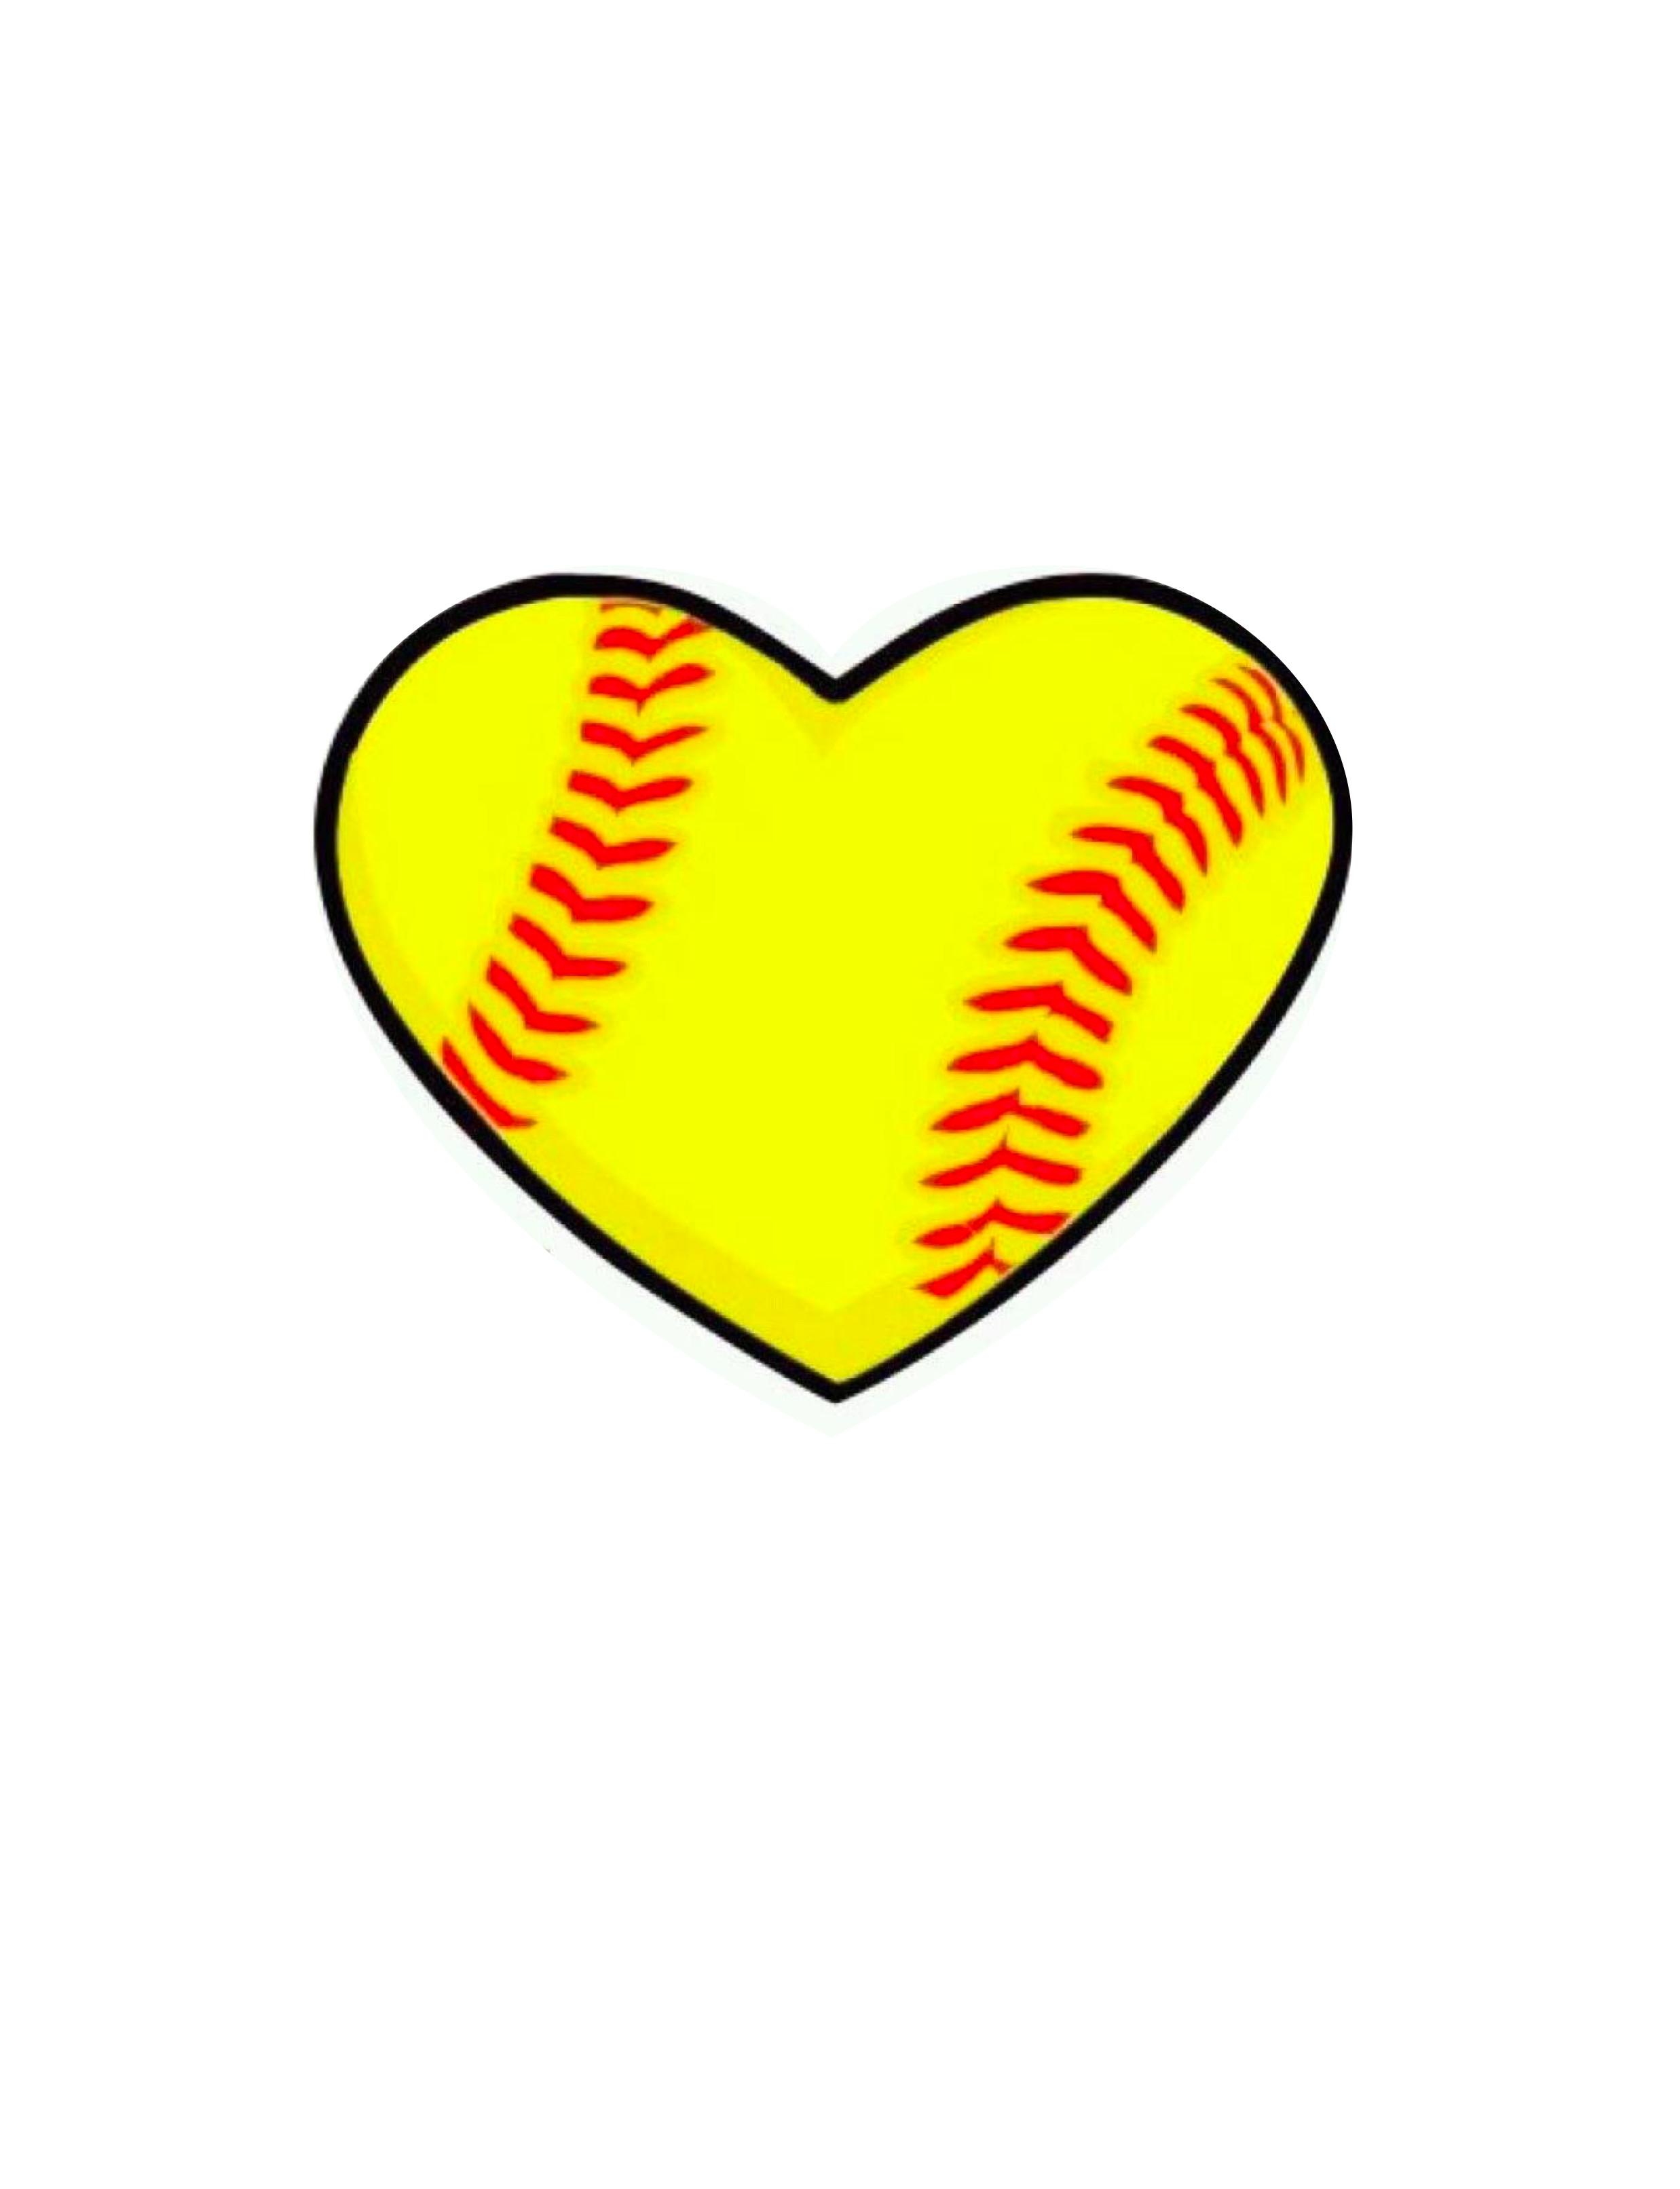 2475x3225 Free Printable Softball Clip Art Mselite97 Fastpitch Showy Heart